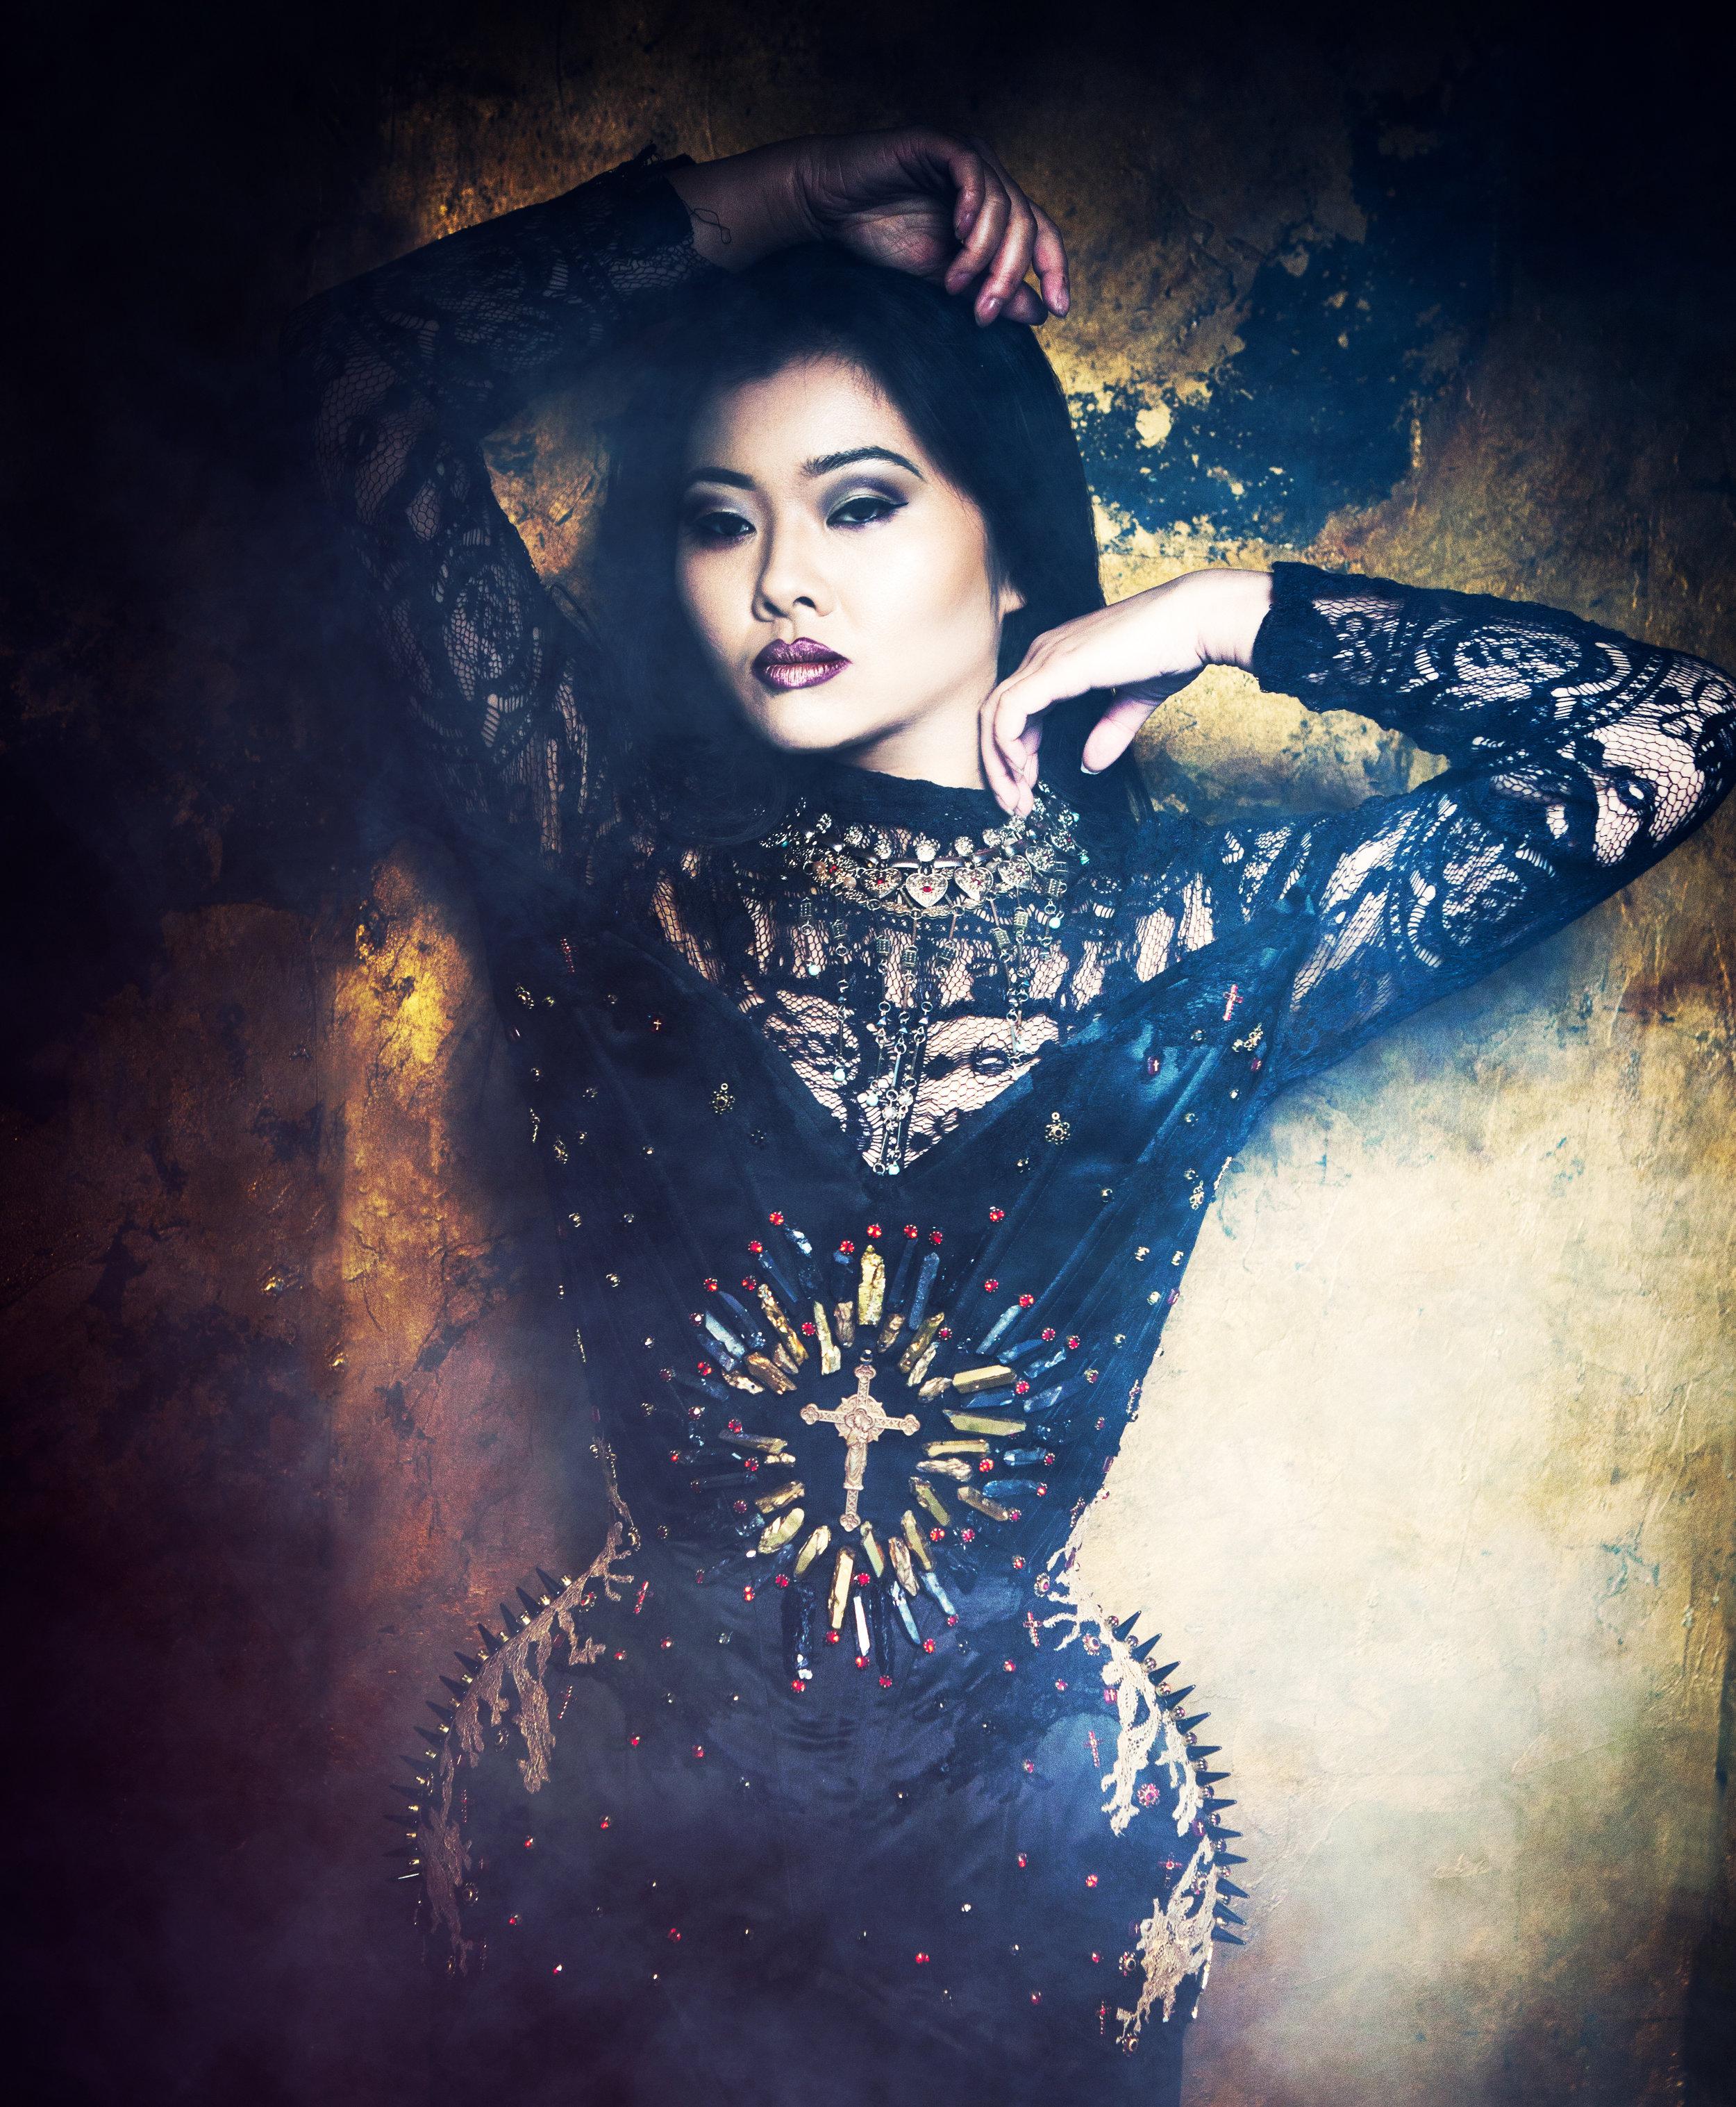 Trinity Corset  Photography: InaGlo Photography  Model: Twig Uk  MUA: Samantha Taylor